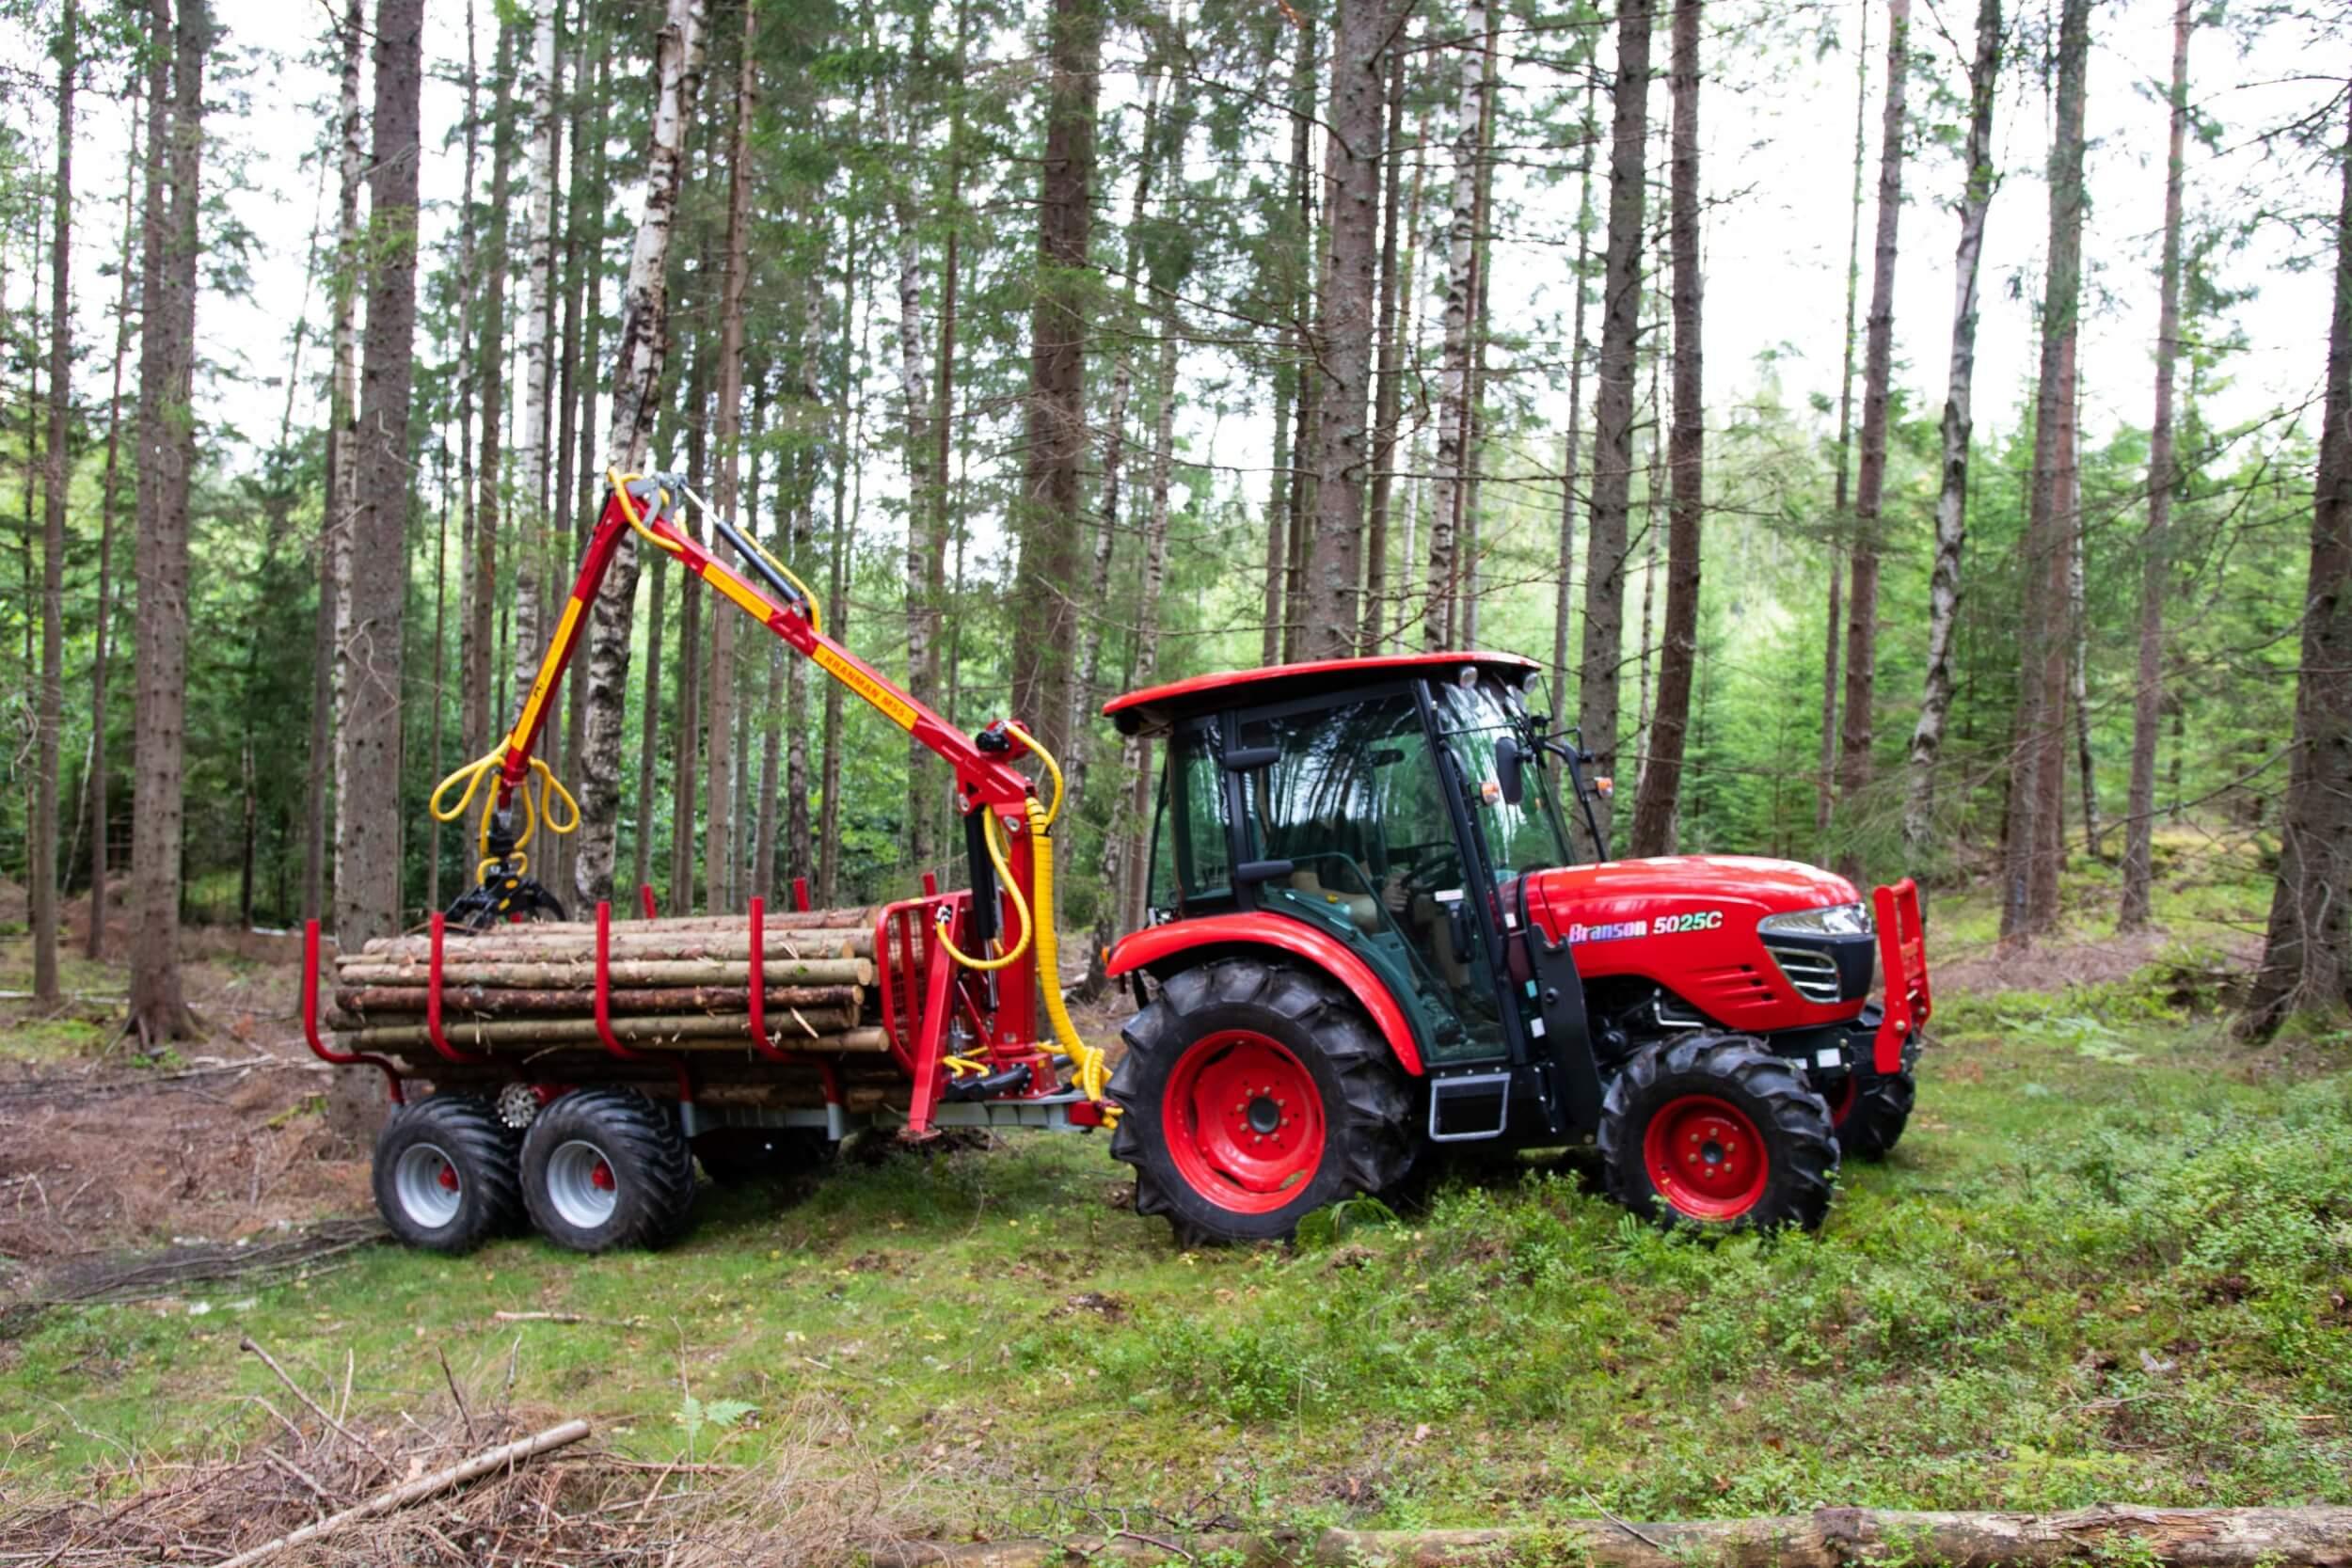 Traktorvagn T5000ex kranman med Branso 5025C